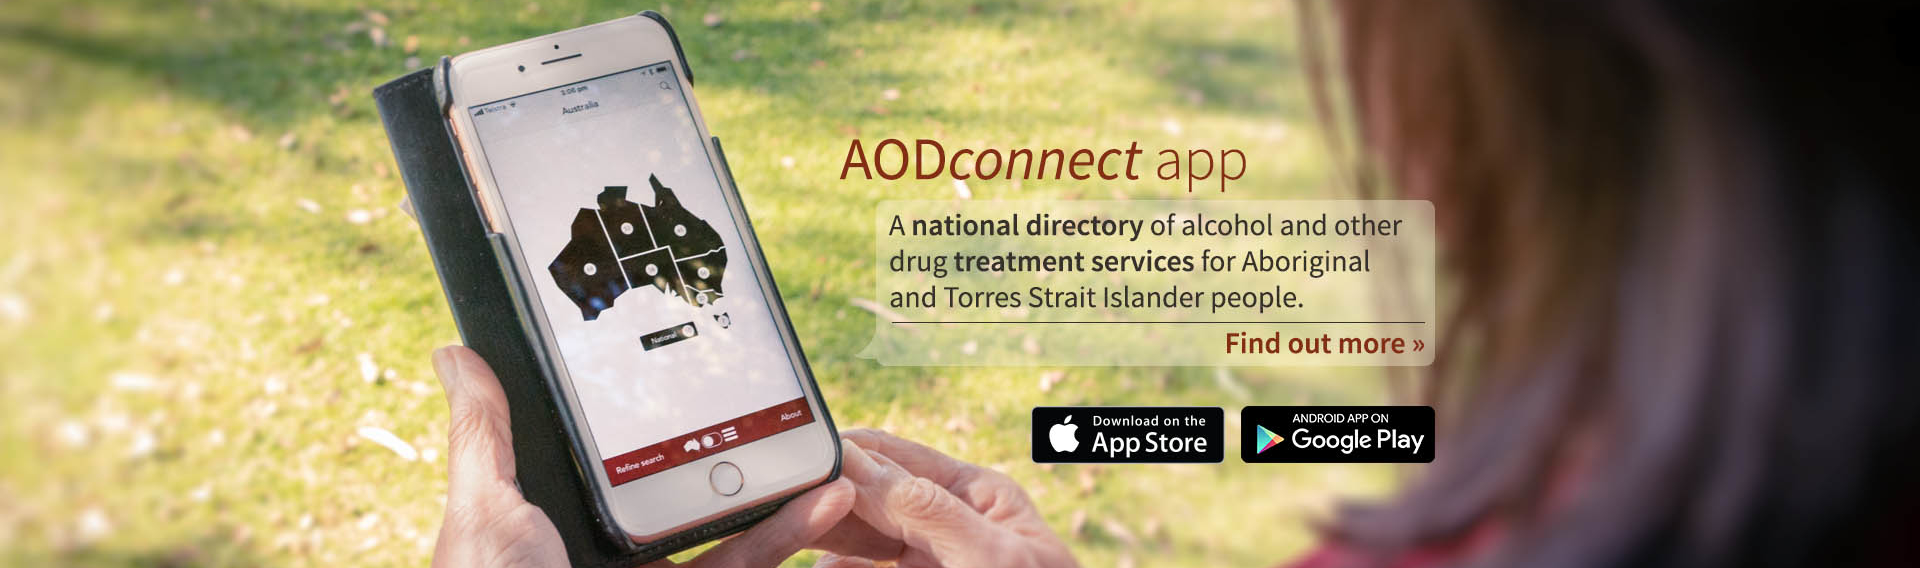 AODconnect app